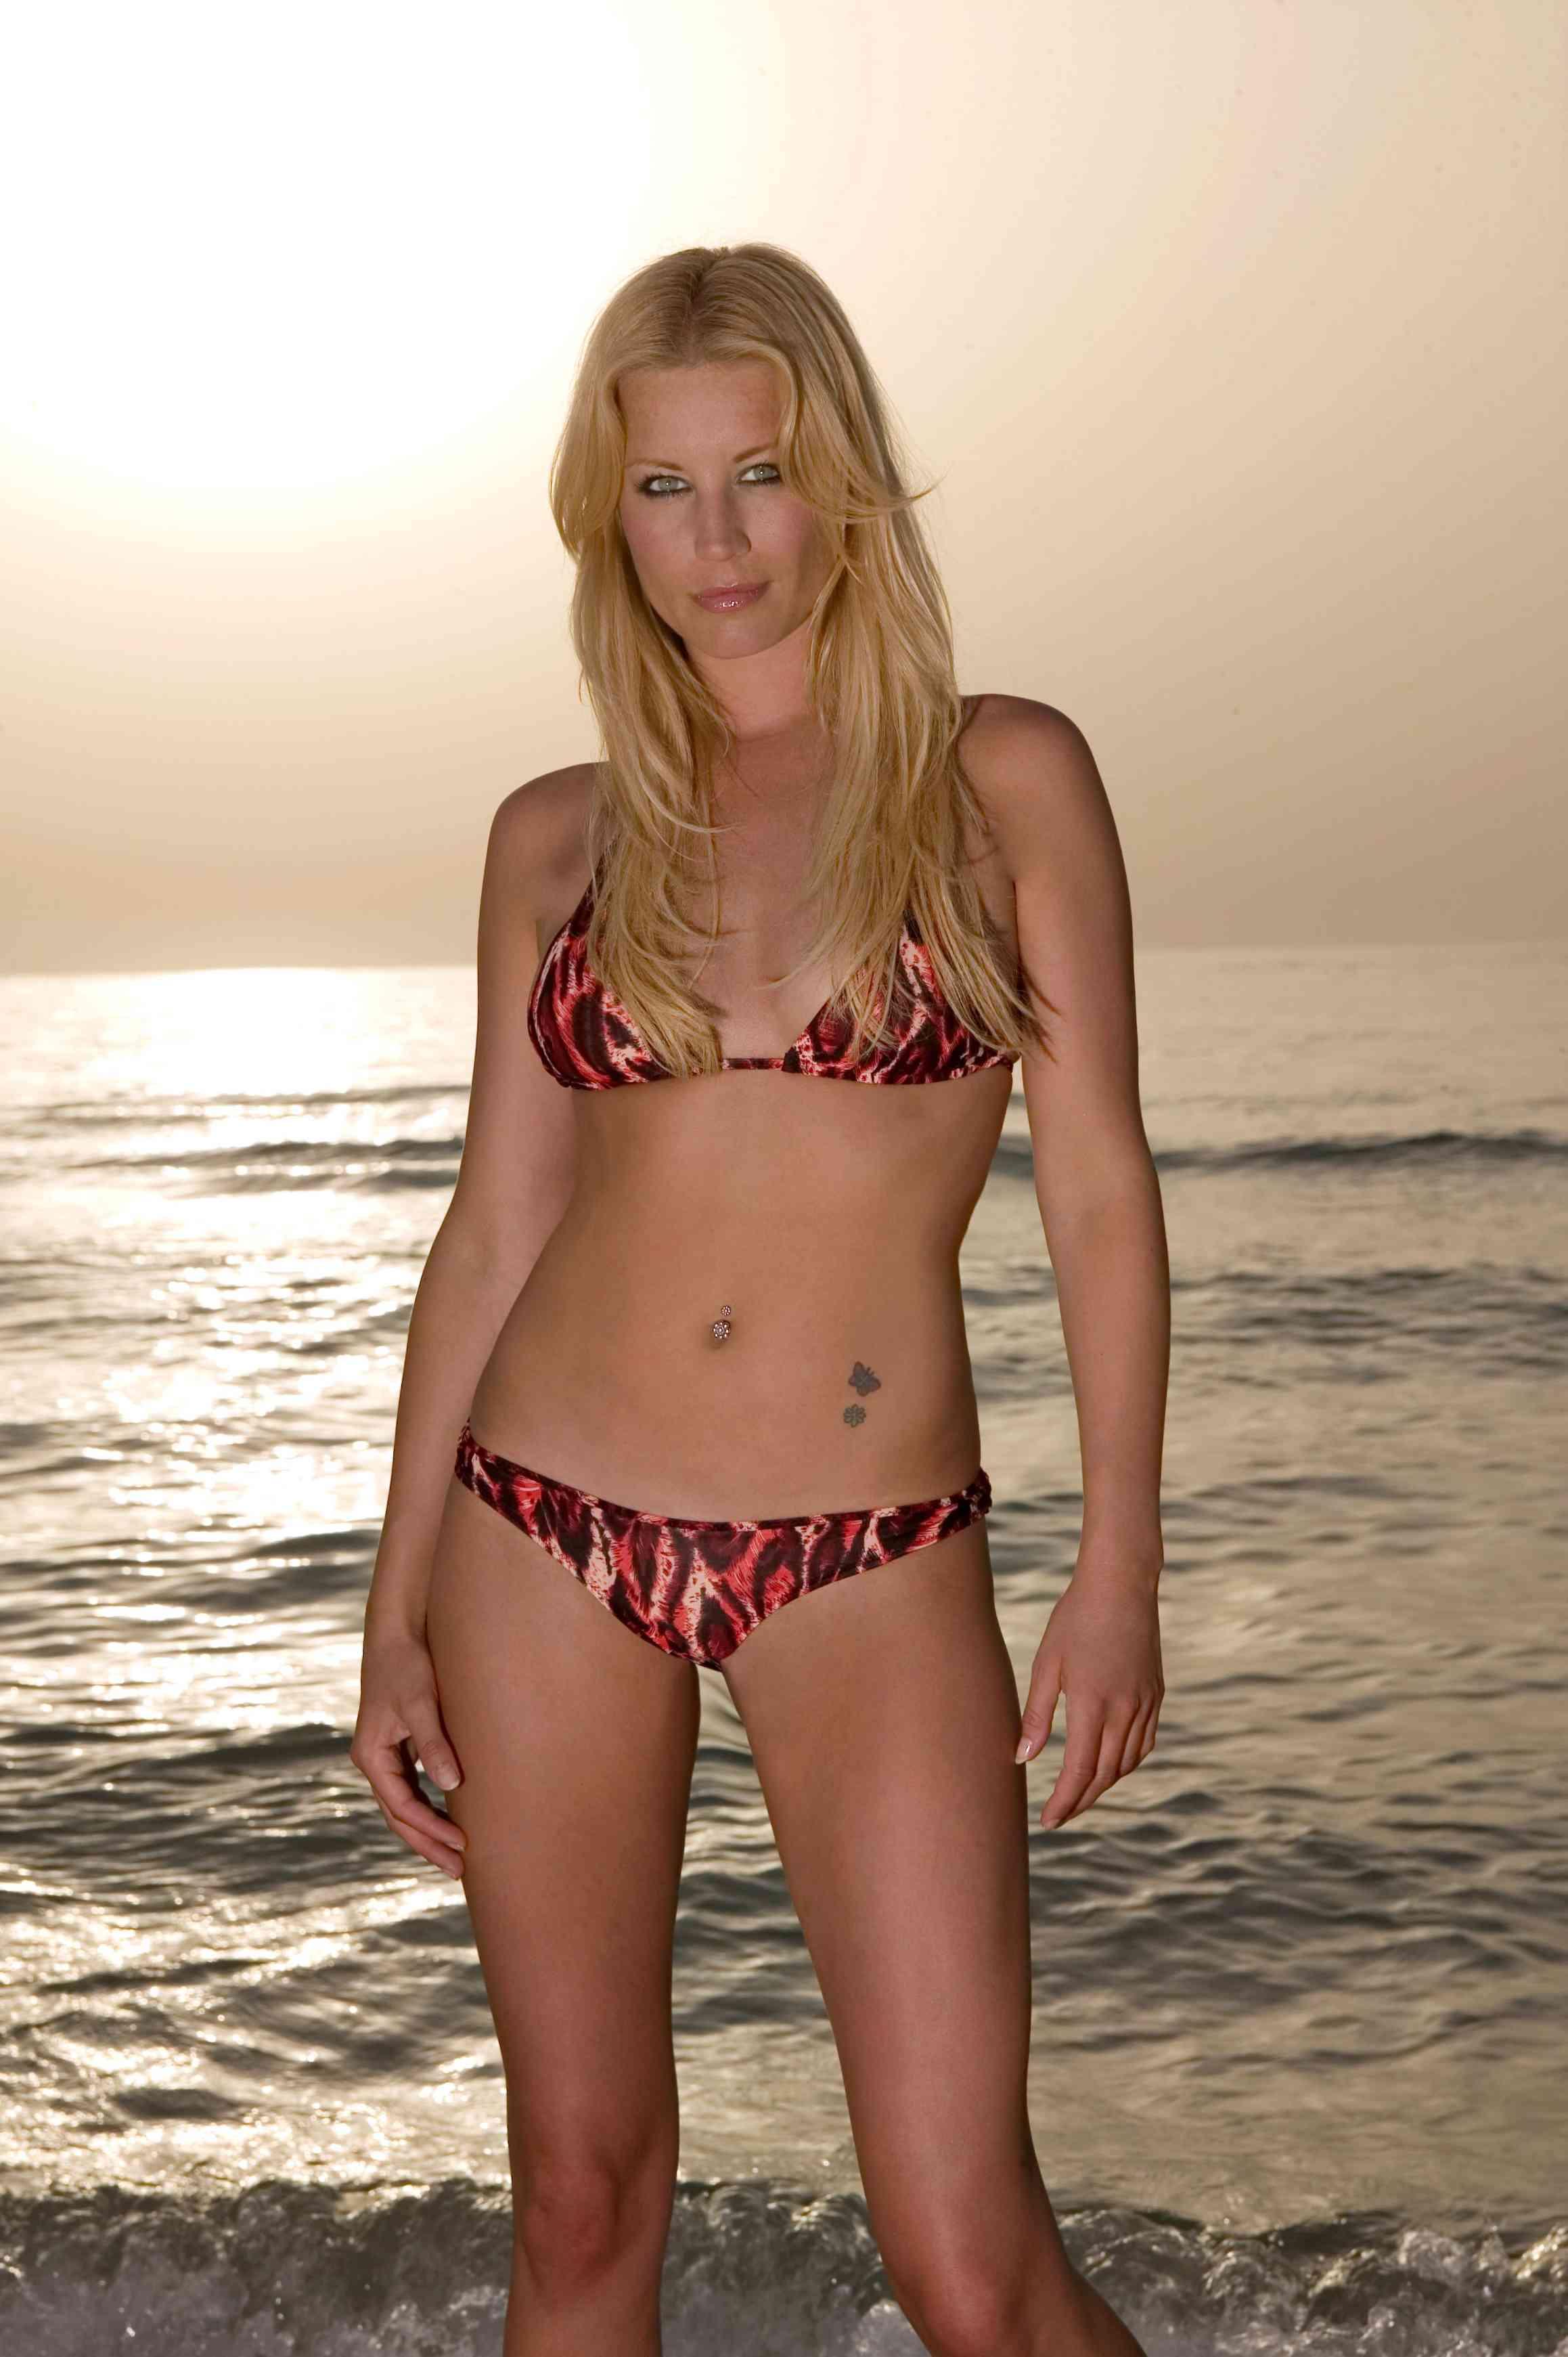 33717_Denise_Van_Outen_Bikini_Wahb_Mabkhout_PS_1_122_582lo.jpg